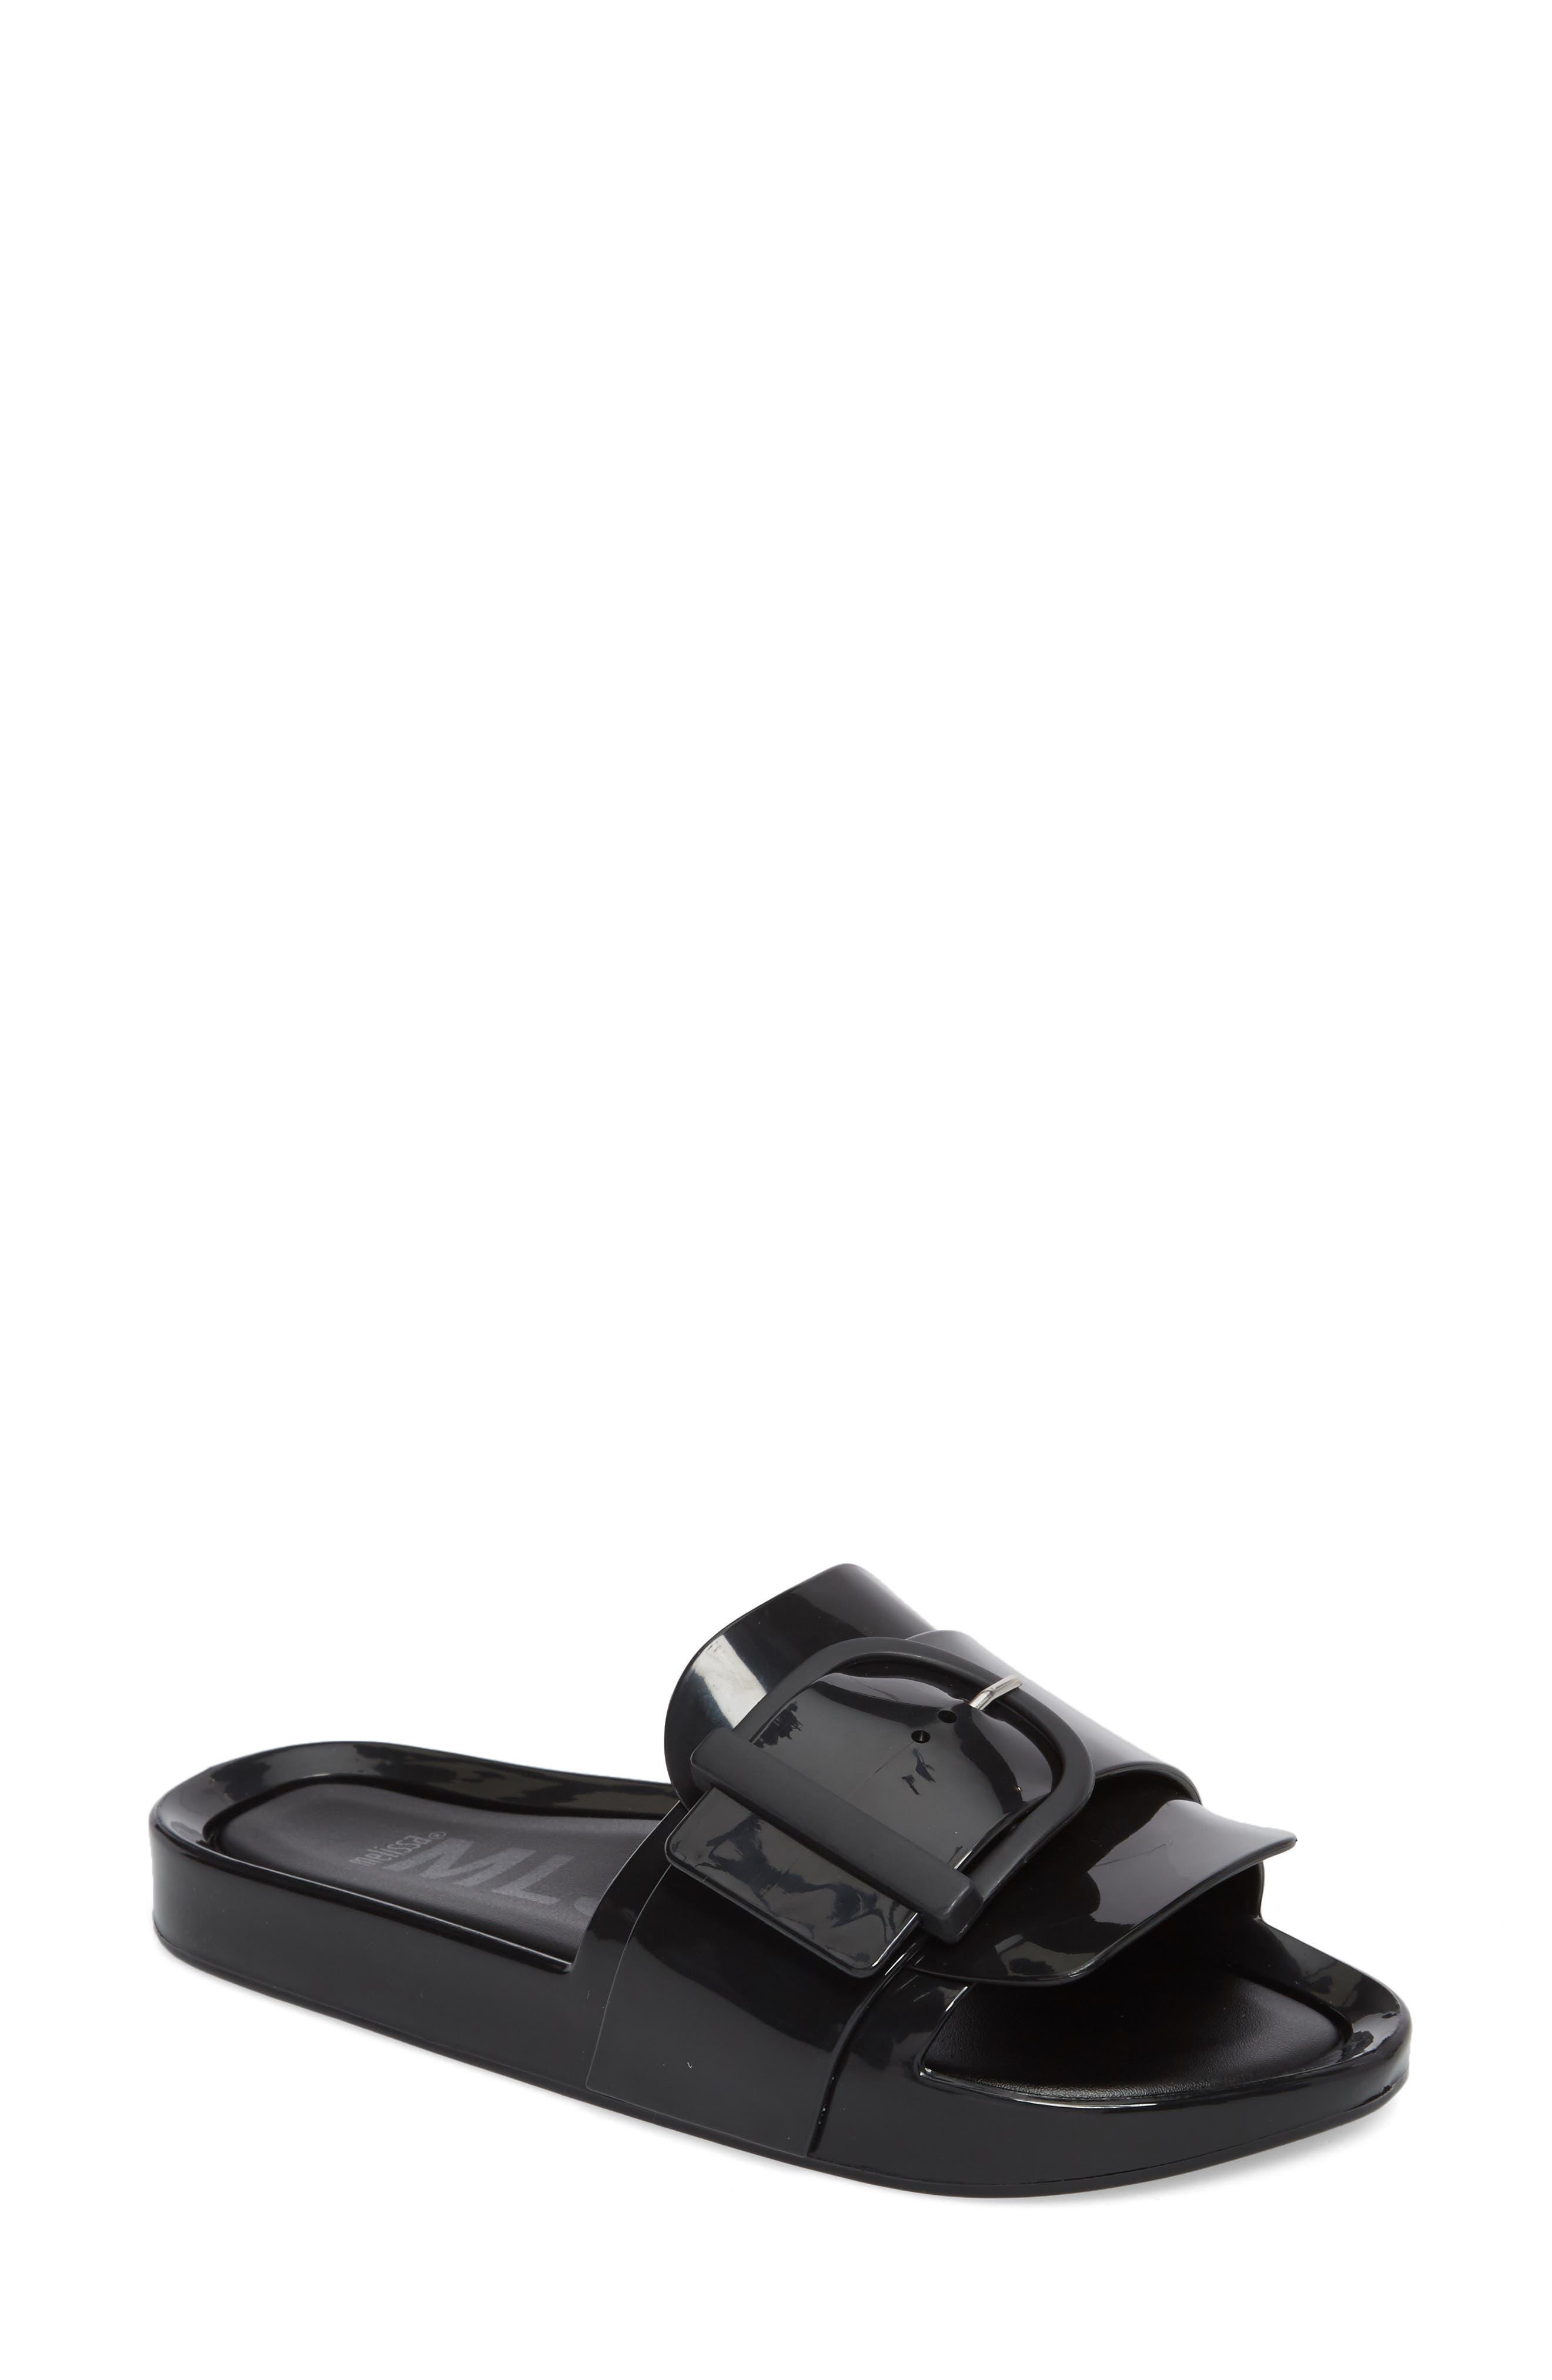 Beach Slide Sandal,                             Main thumbnail 1, color,                             BLACK